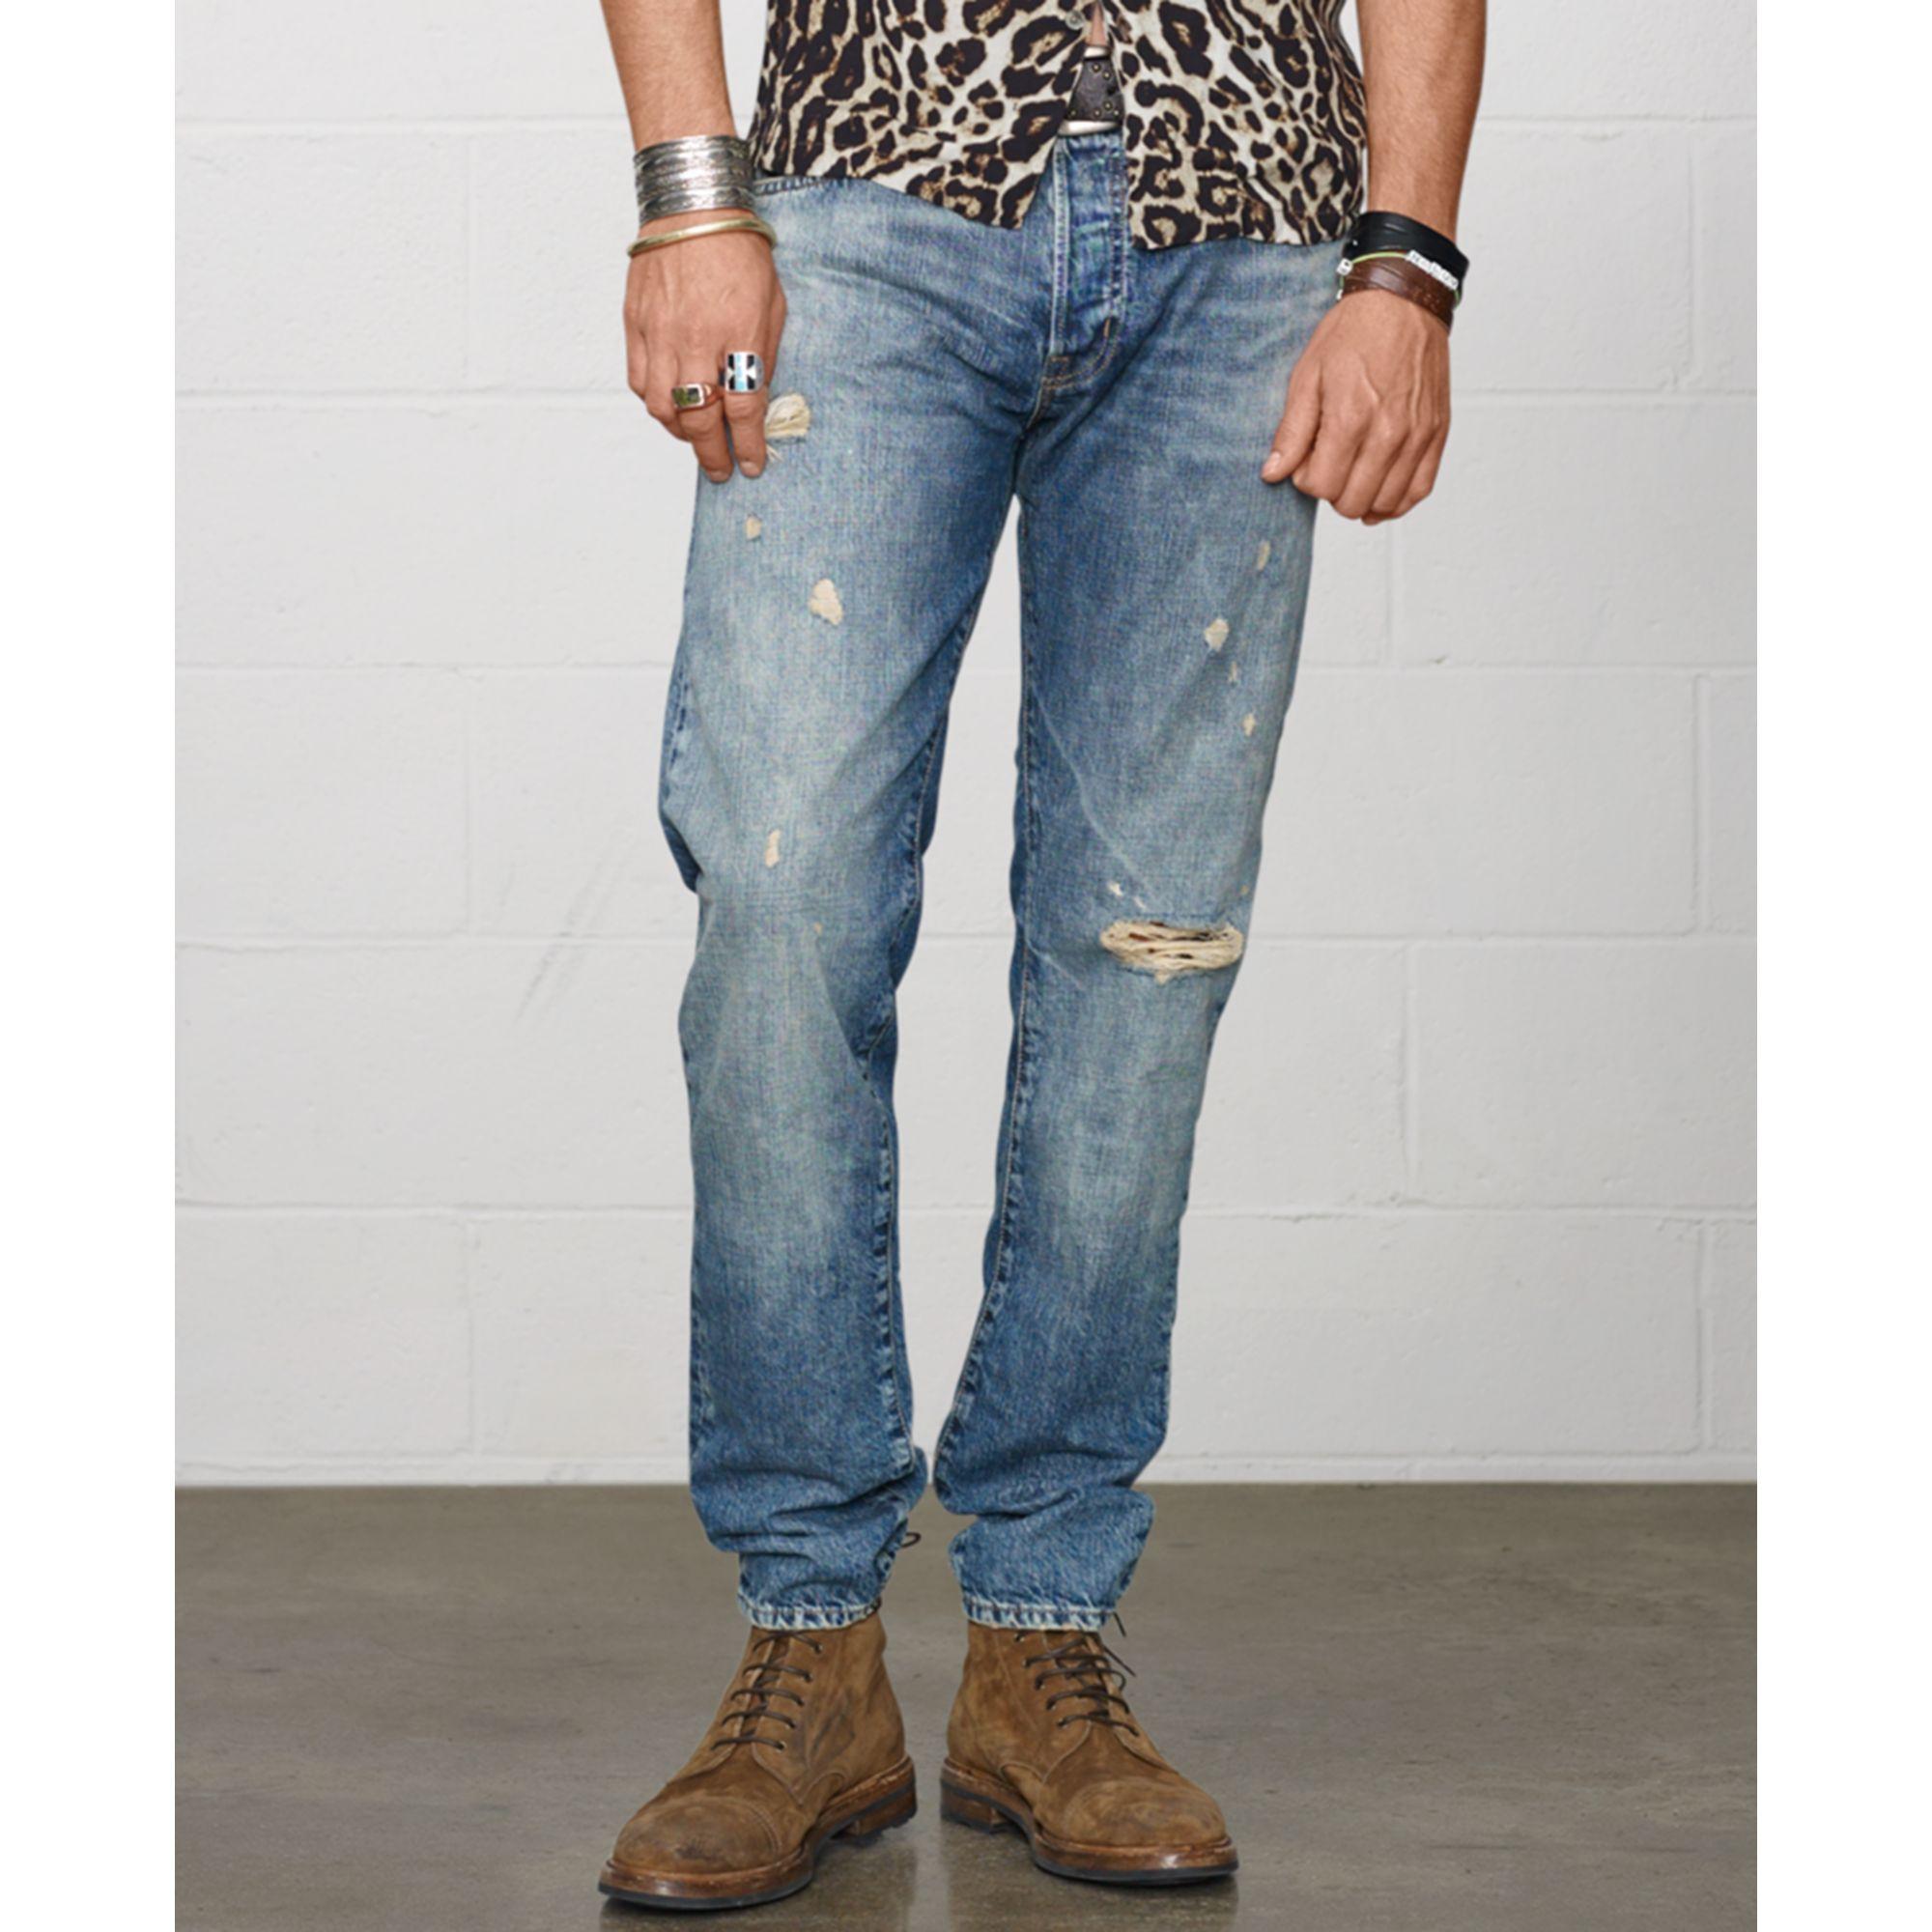 lyst denim supply ralph lauren tapered straight jeans in blue for men. Black Bedroom Furniture Sets. Home Design Ideas